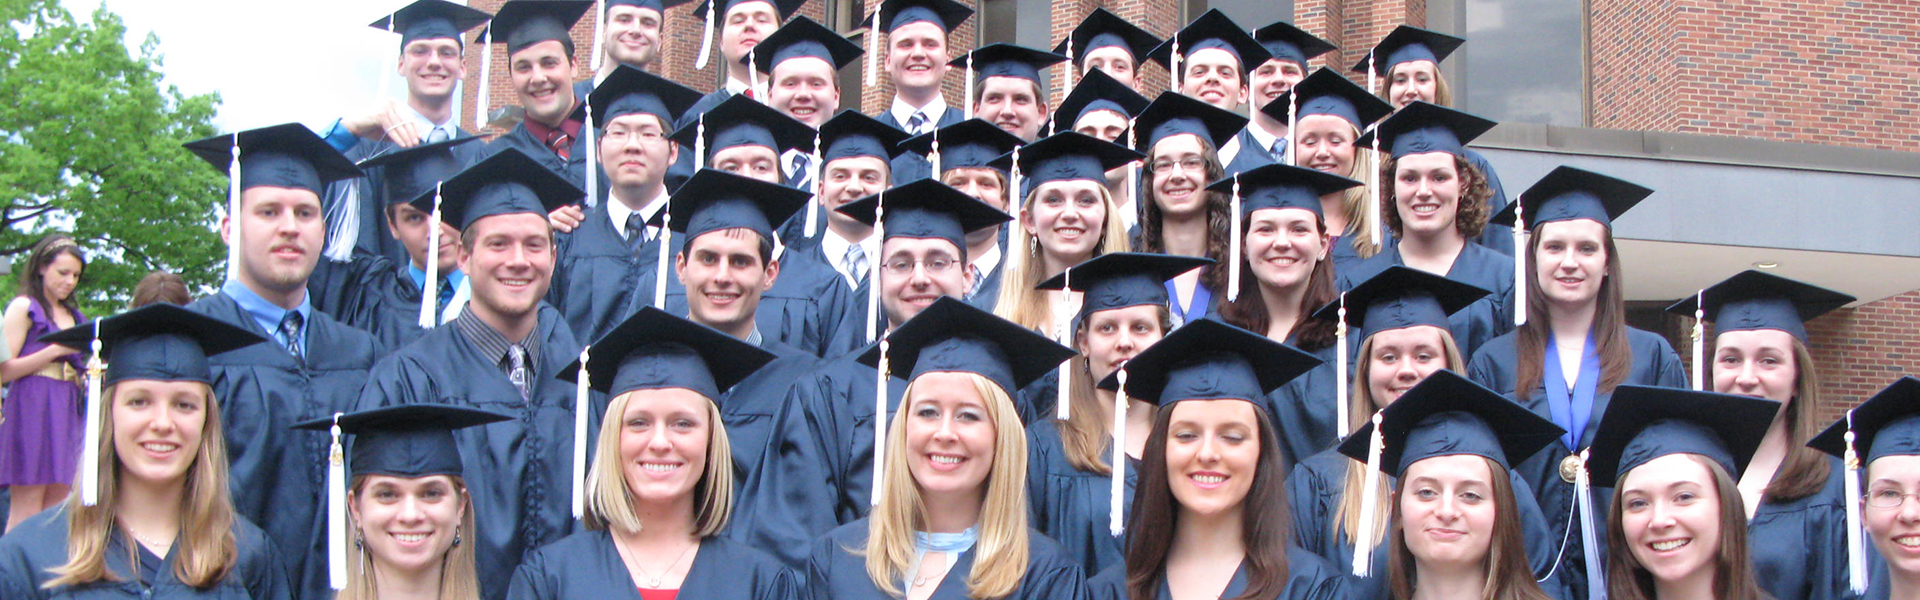 Meteorology graduates